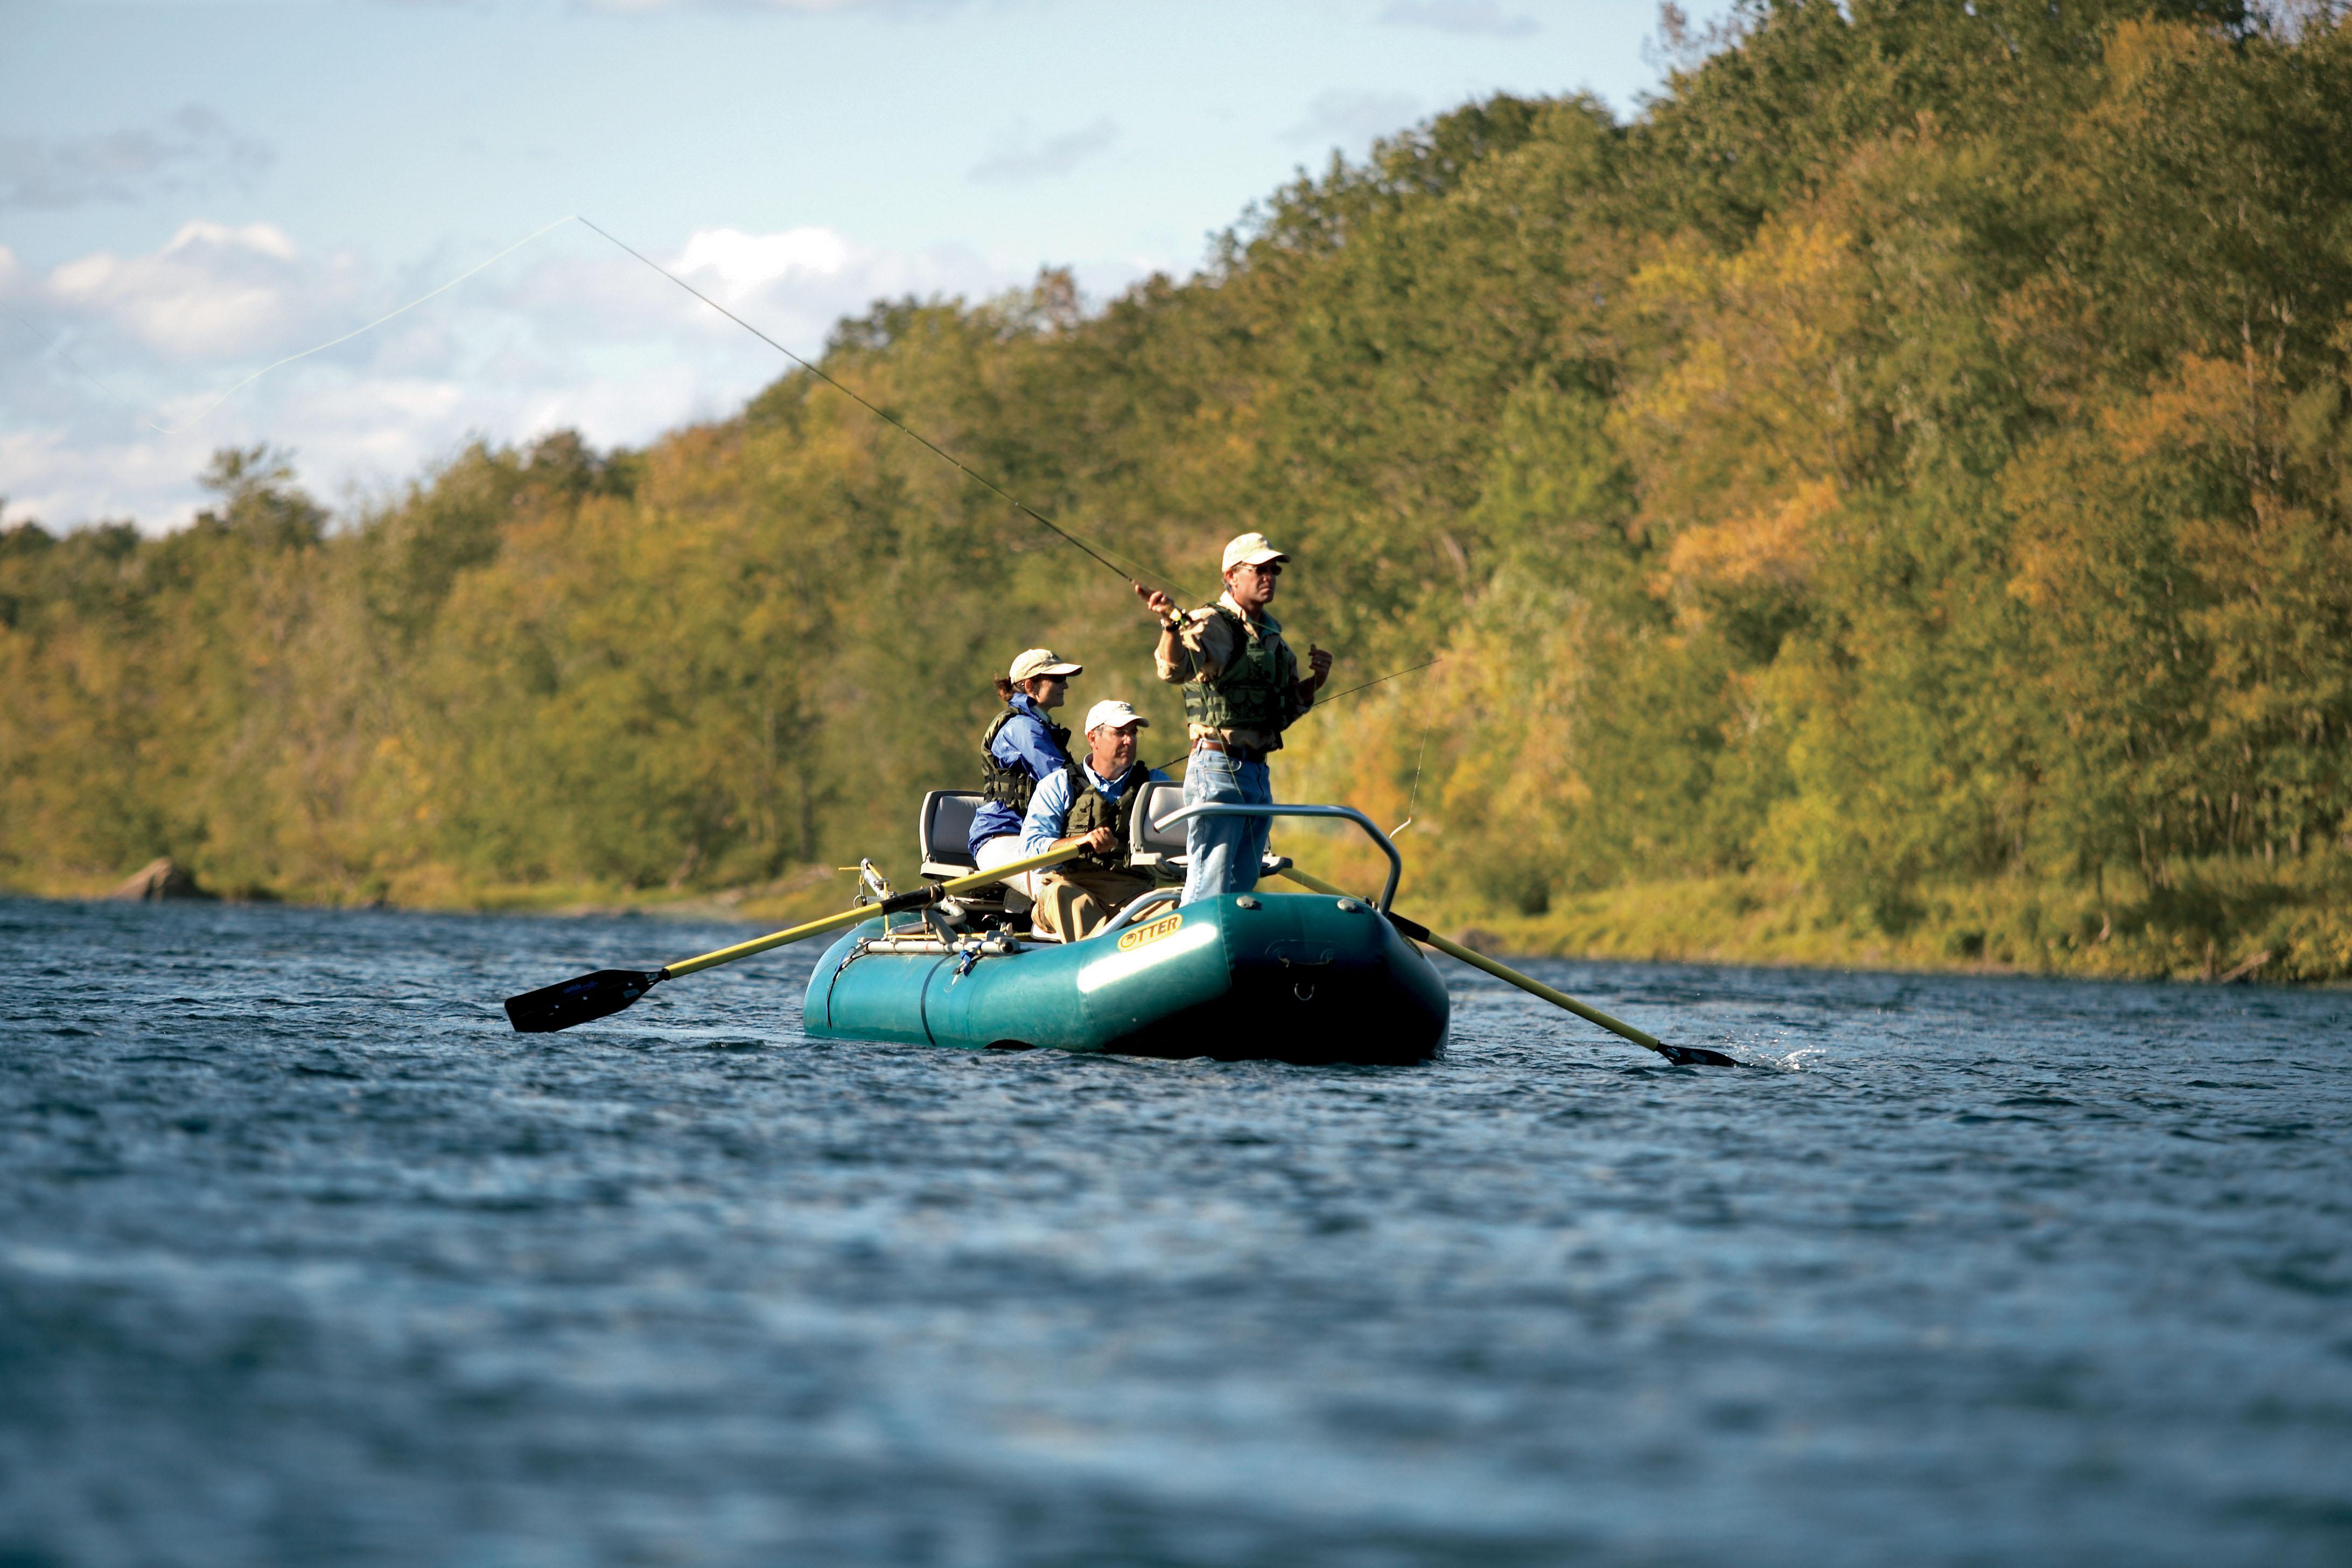 Bass Fishing Background 4368x2912